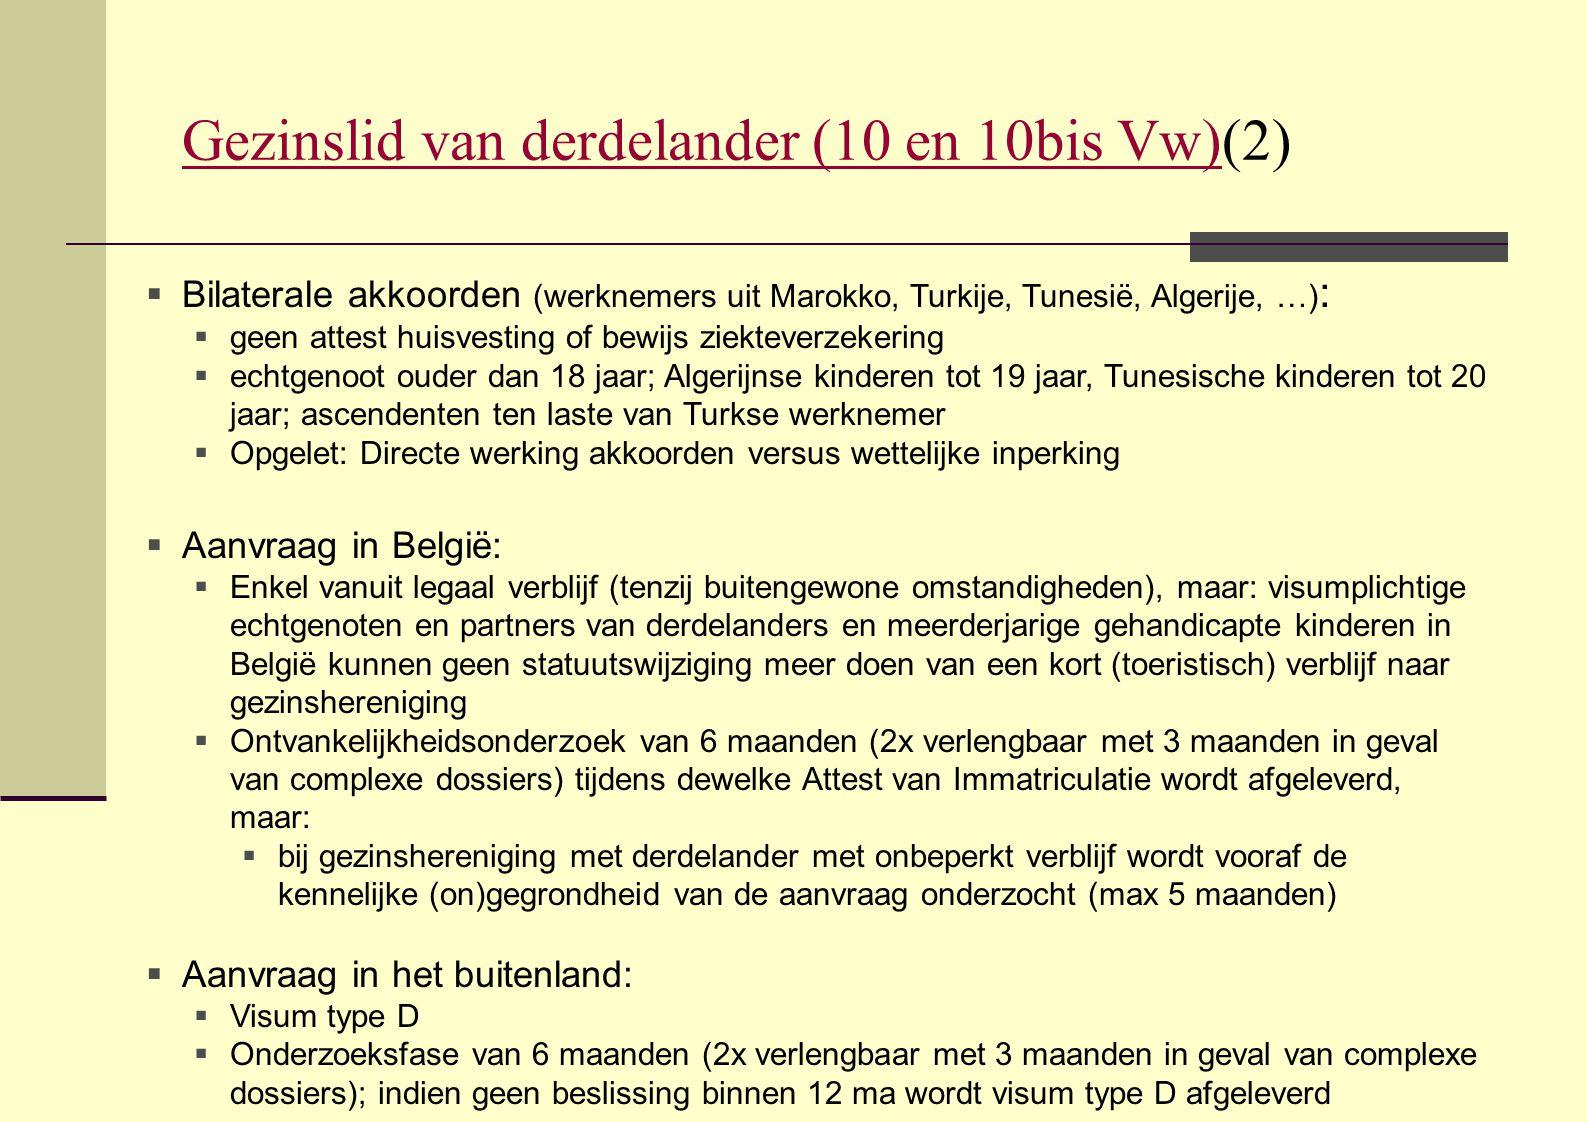 Gezinslid van derdelander (10 en 10bis Vw)Gezinslid van derdelander (10 en 10bis Vw)(2)  Bilaterale akkoorden (werknemers uit Marokko, Turkije, Tunes